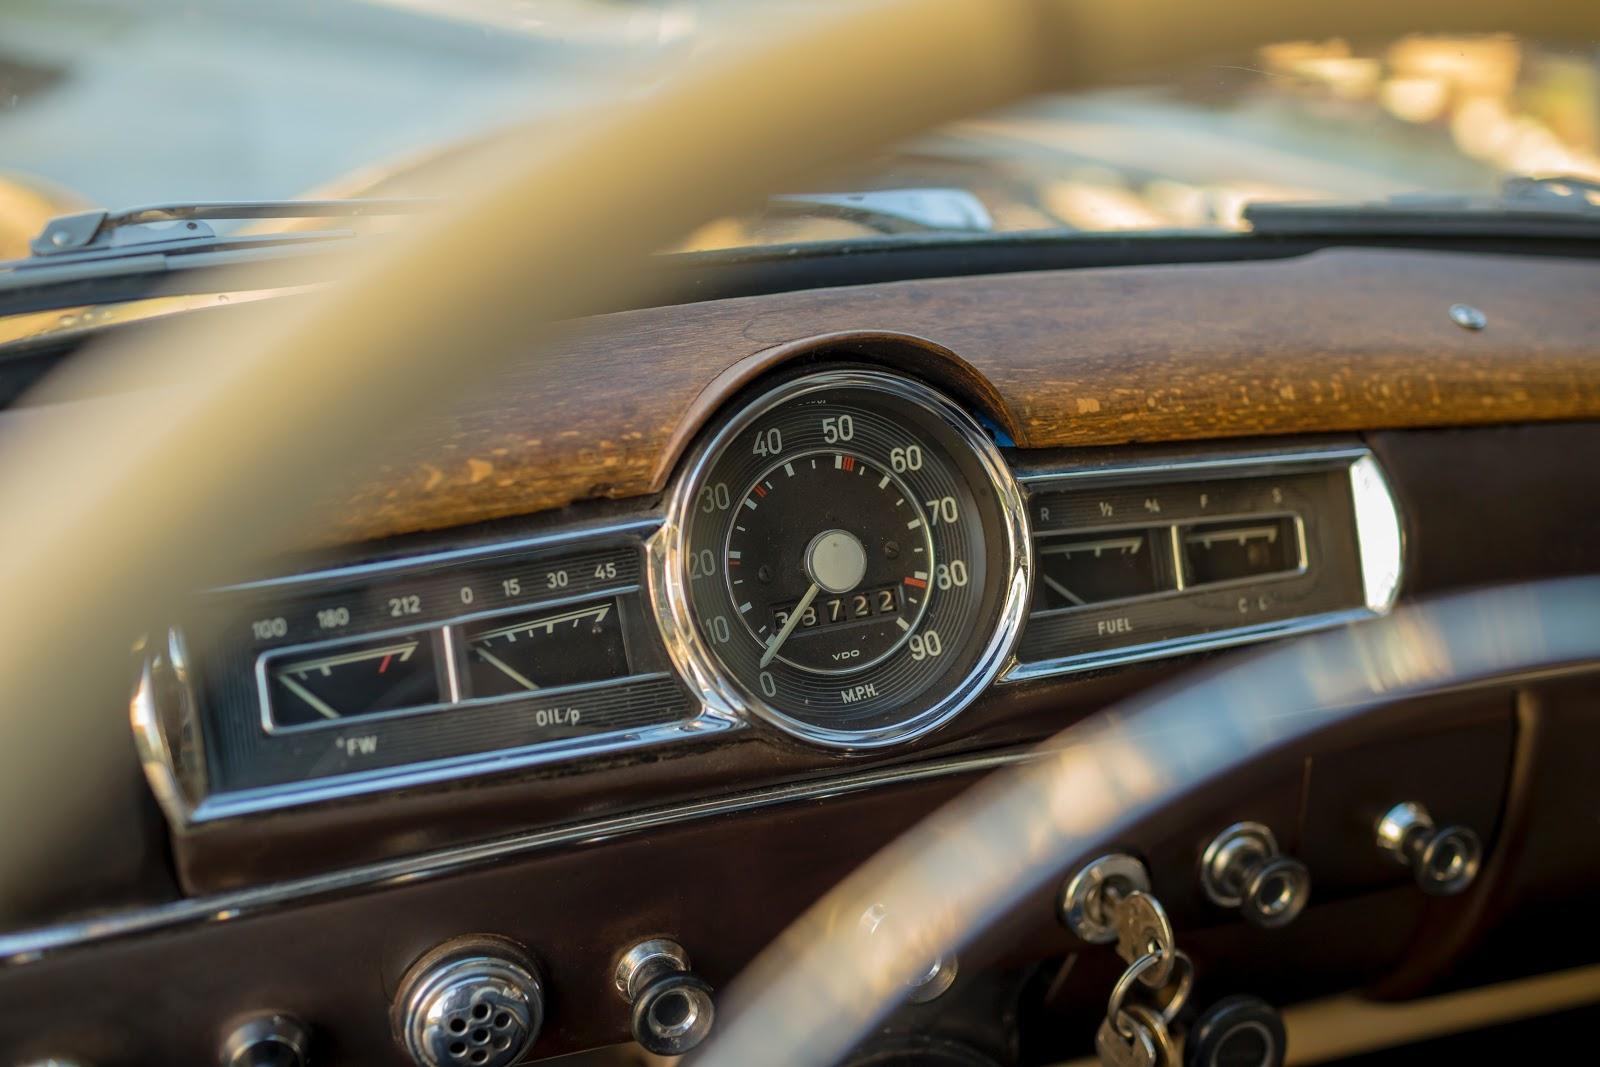 An old-fashioned dashboard in a car.